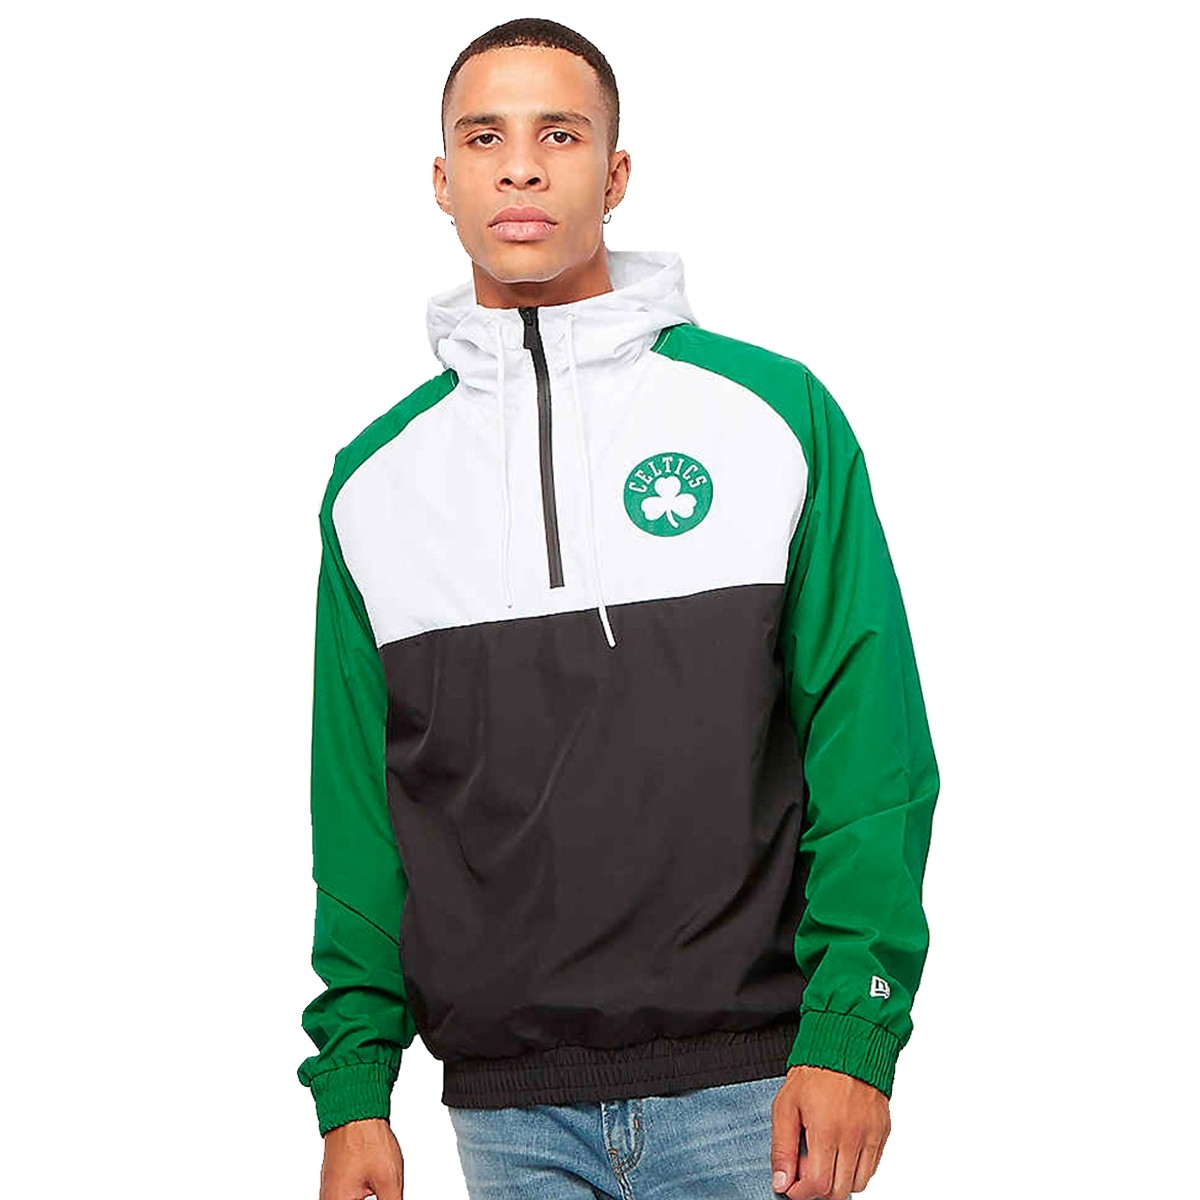 New Era Windbreaker Jacket 'Celtics'